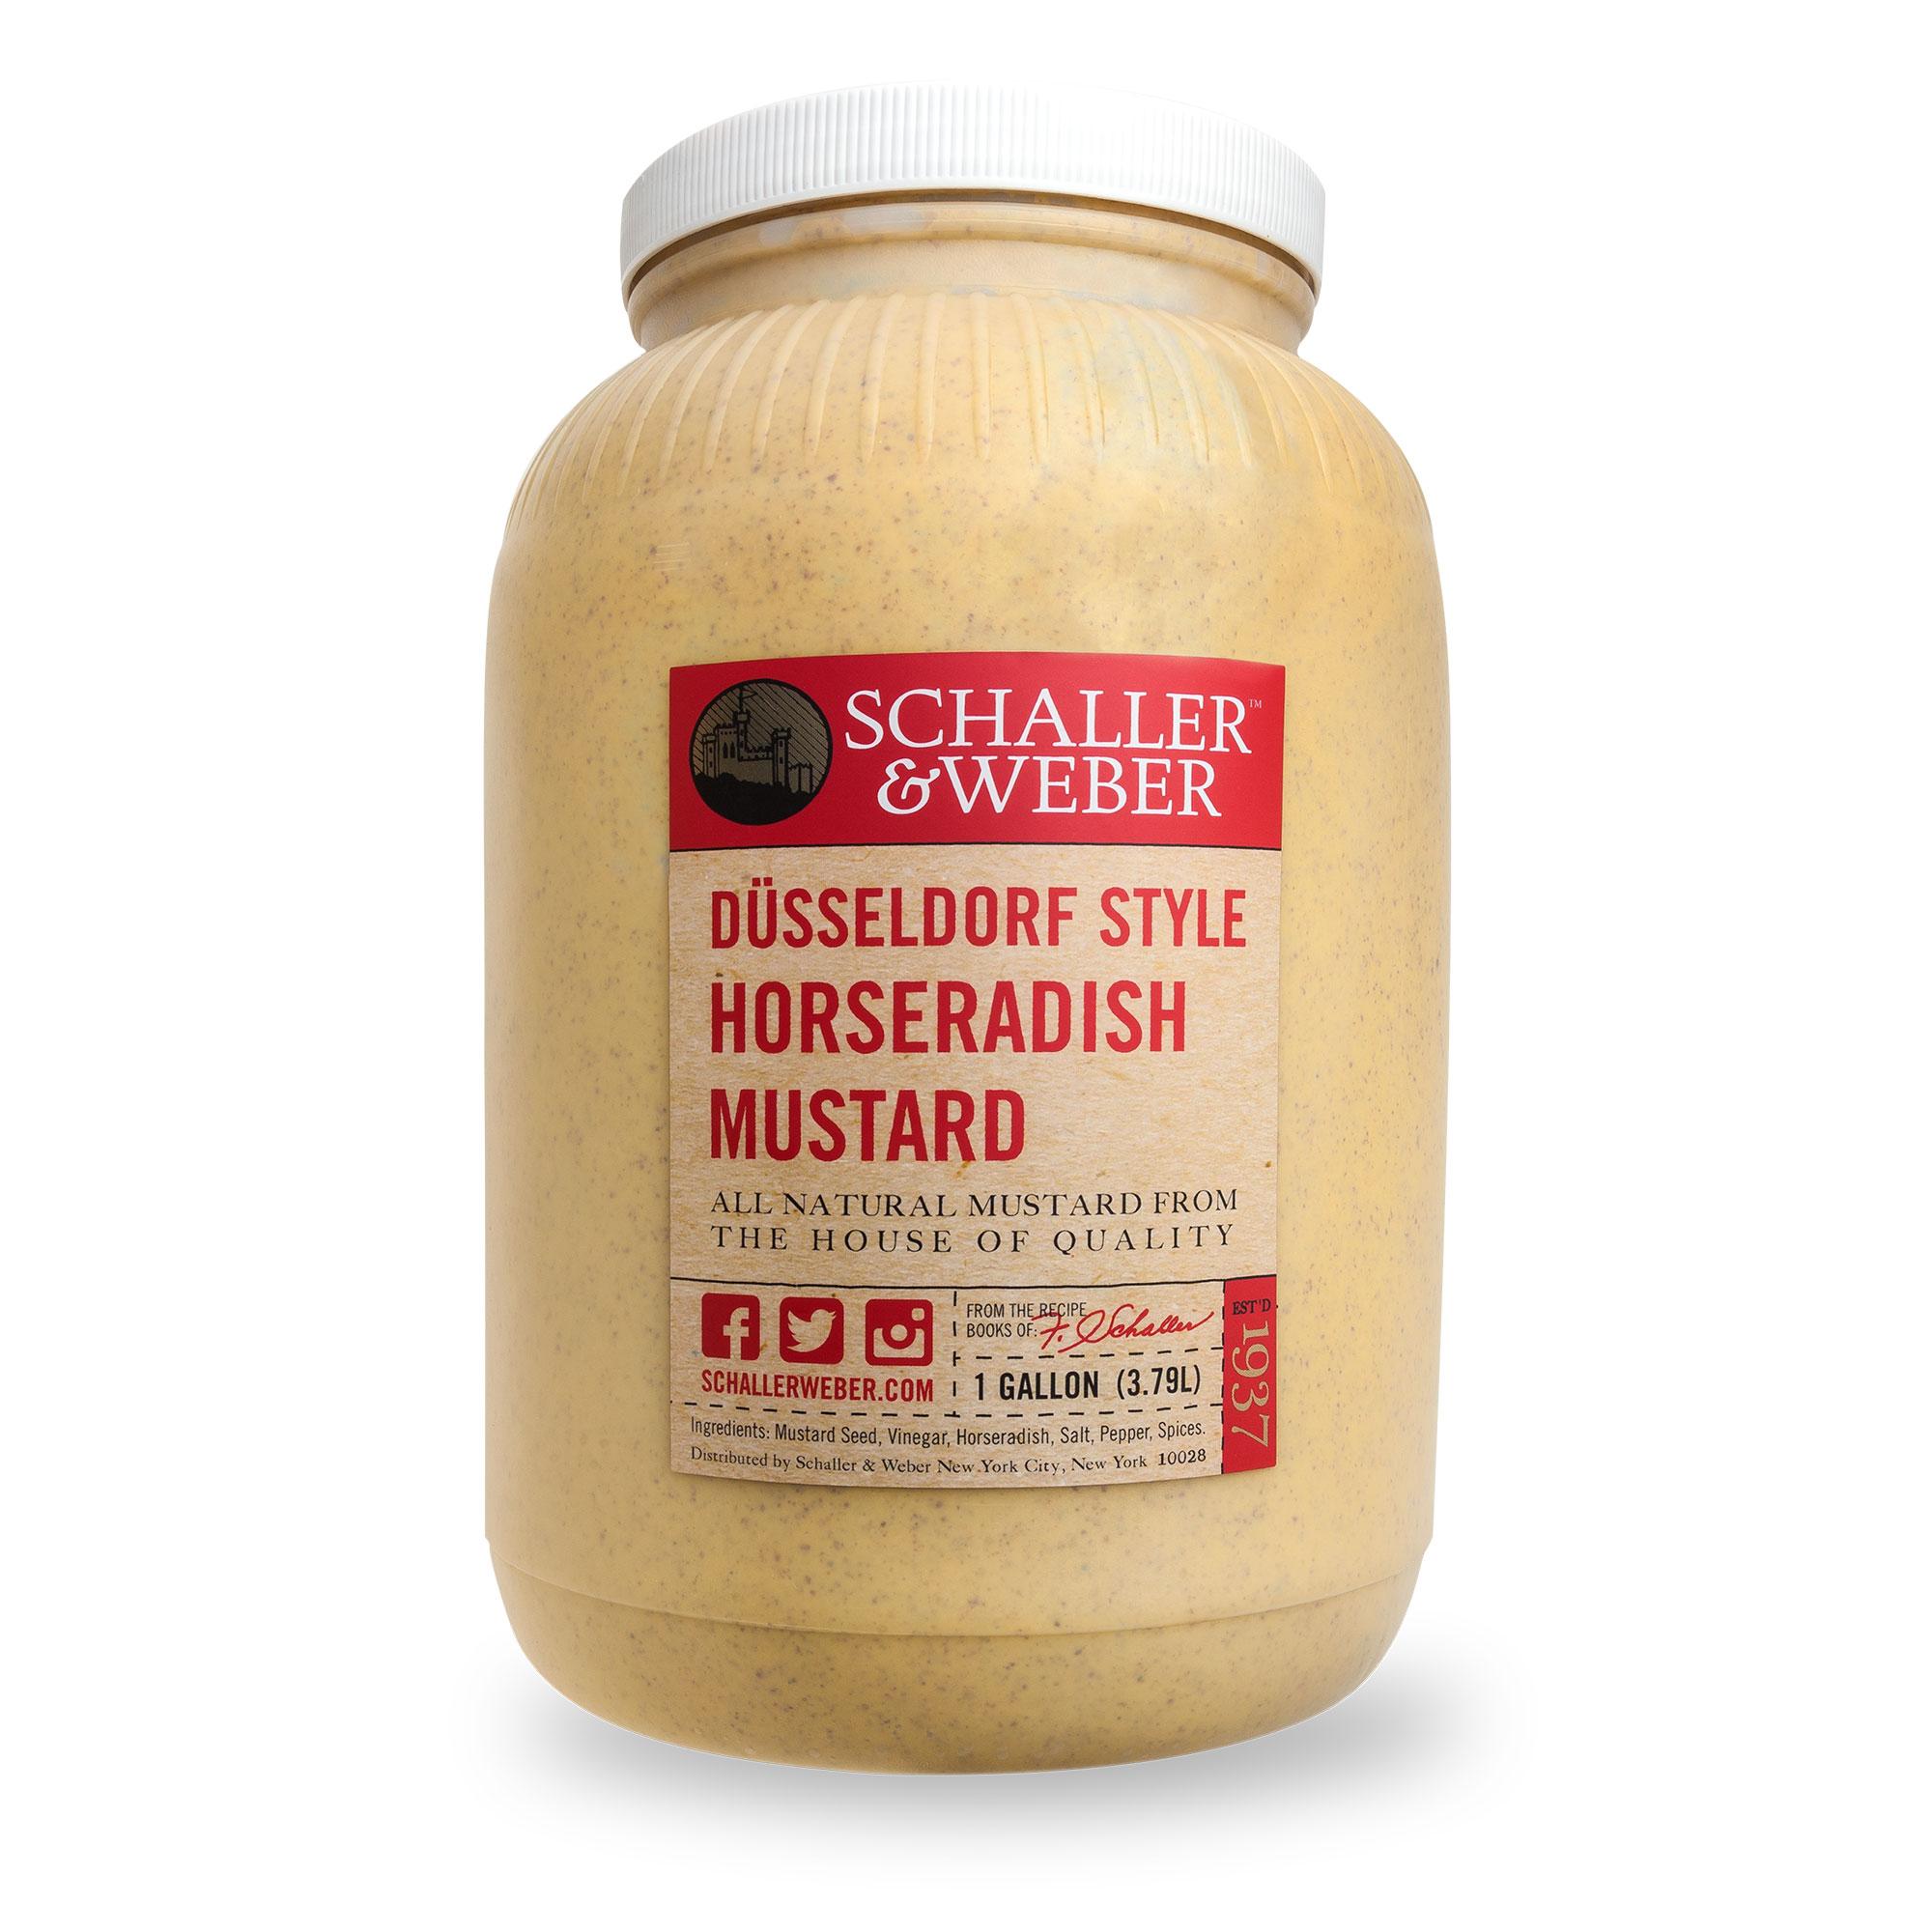 düsseldorf horseradish mustard schaller weber